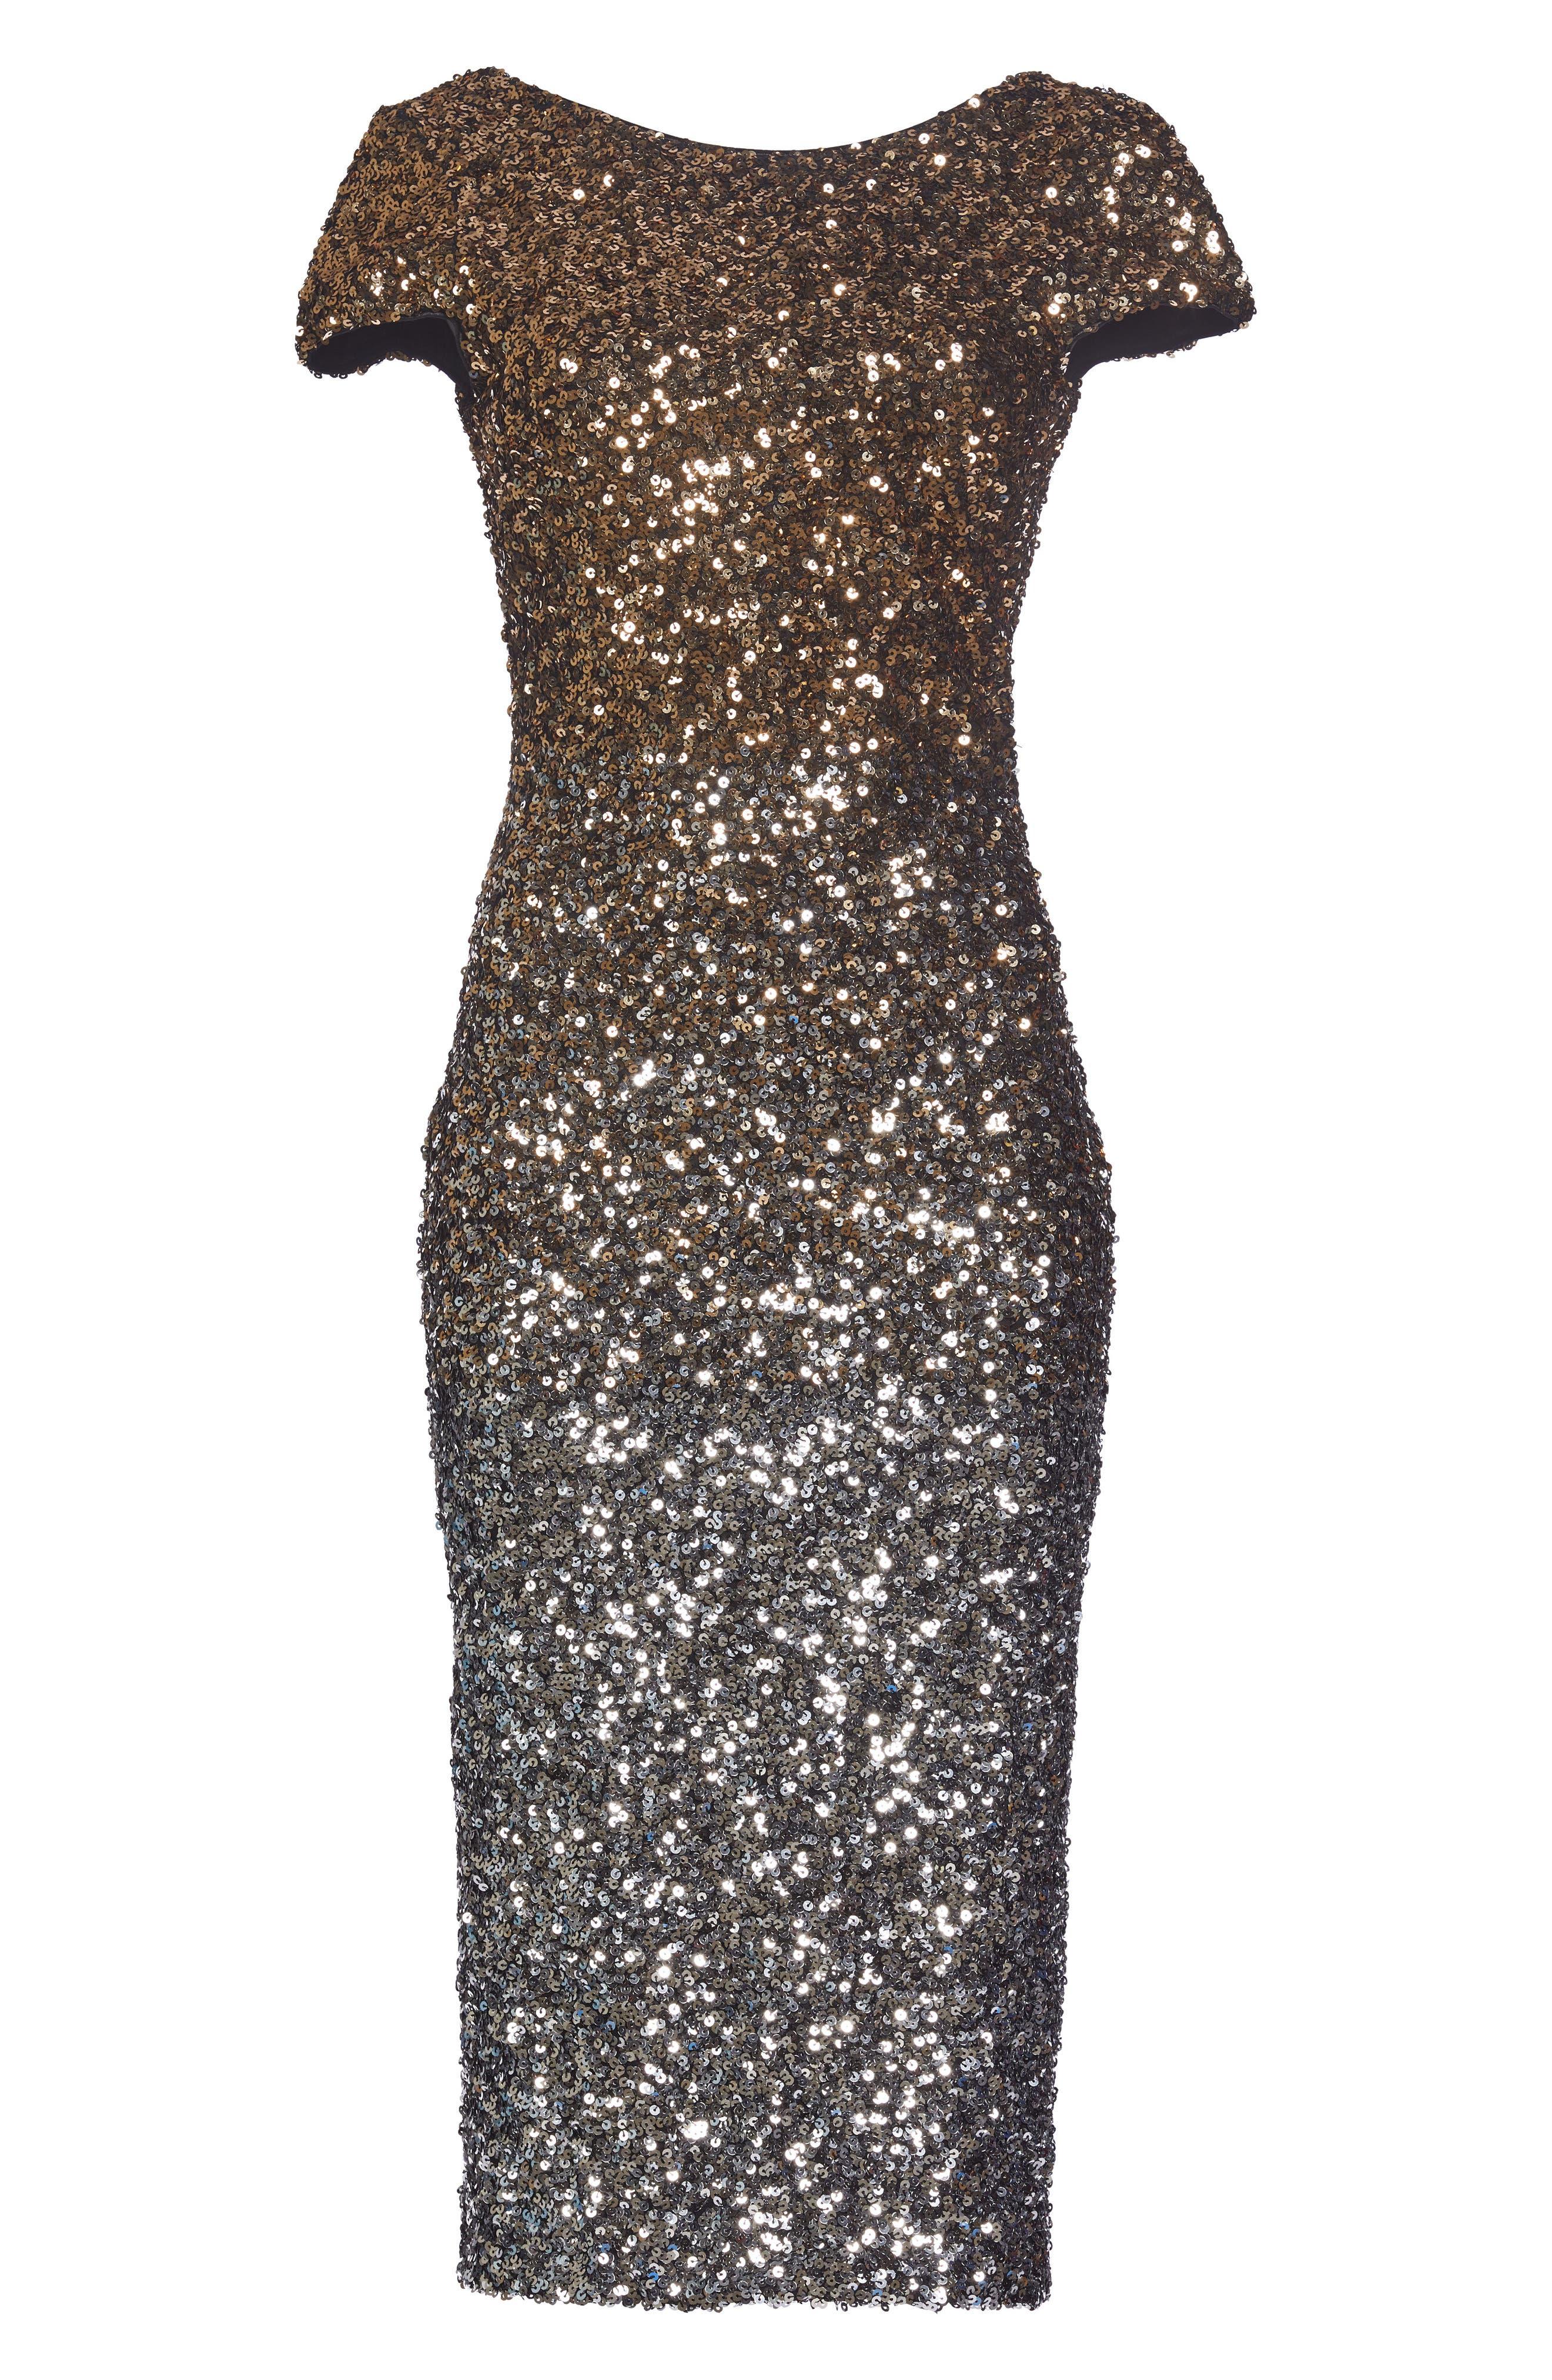 Marcella Ombré Sequin Body-Con Dress,                             Alternate thumbnail 5, color,                             Silver/ Gold